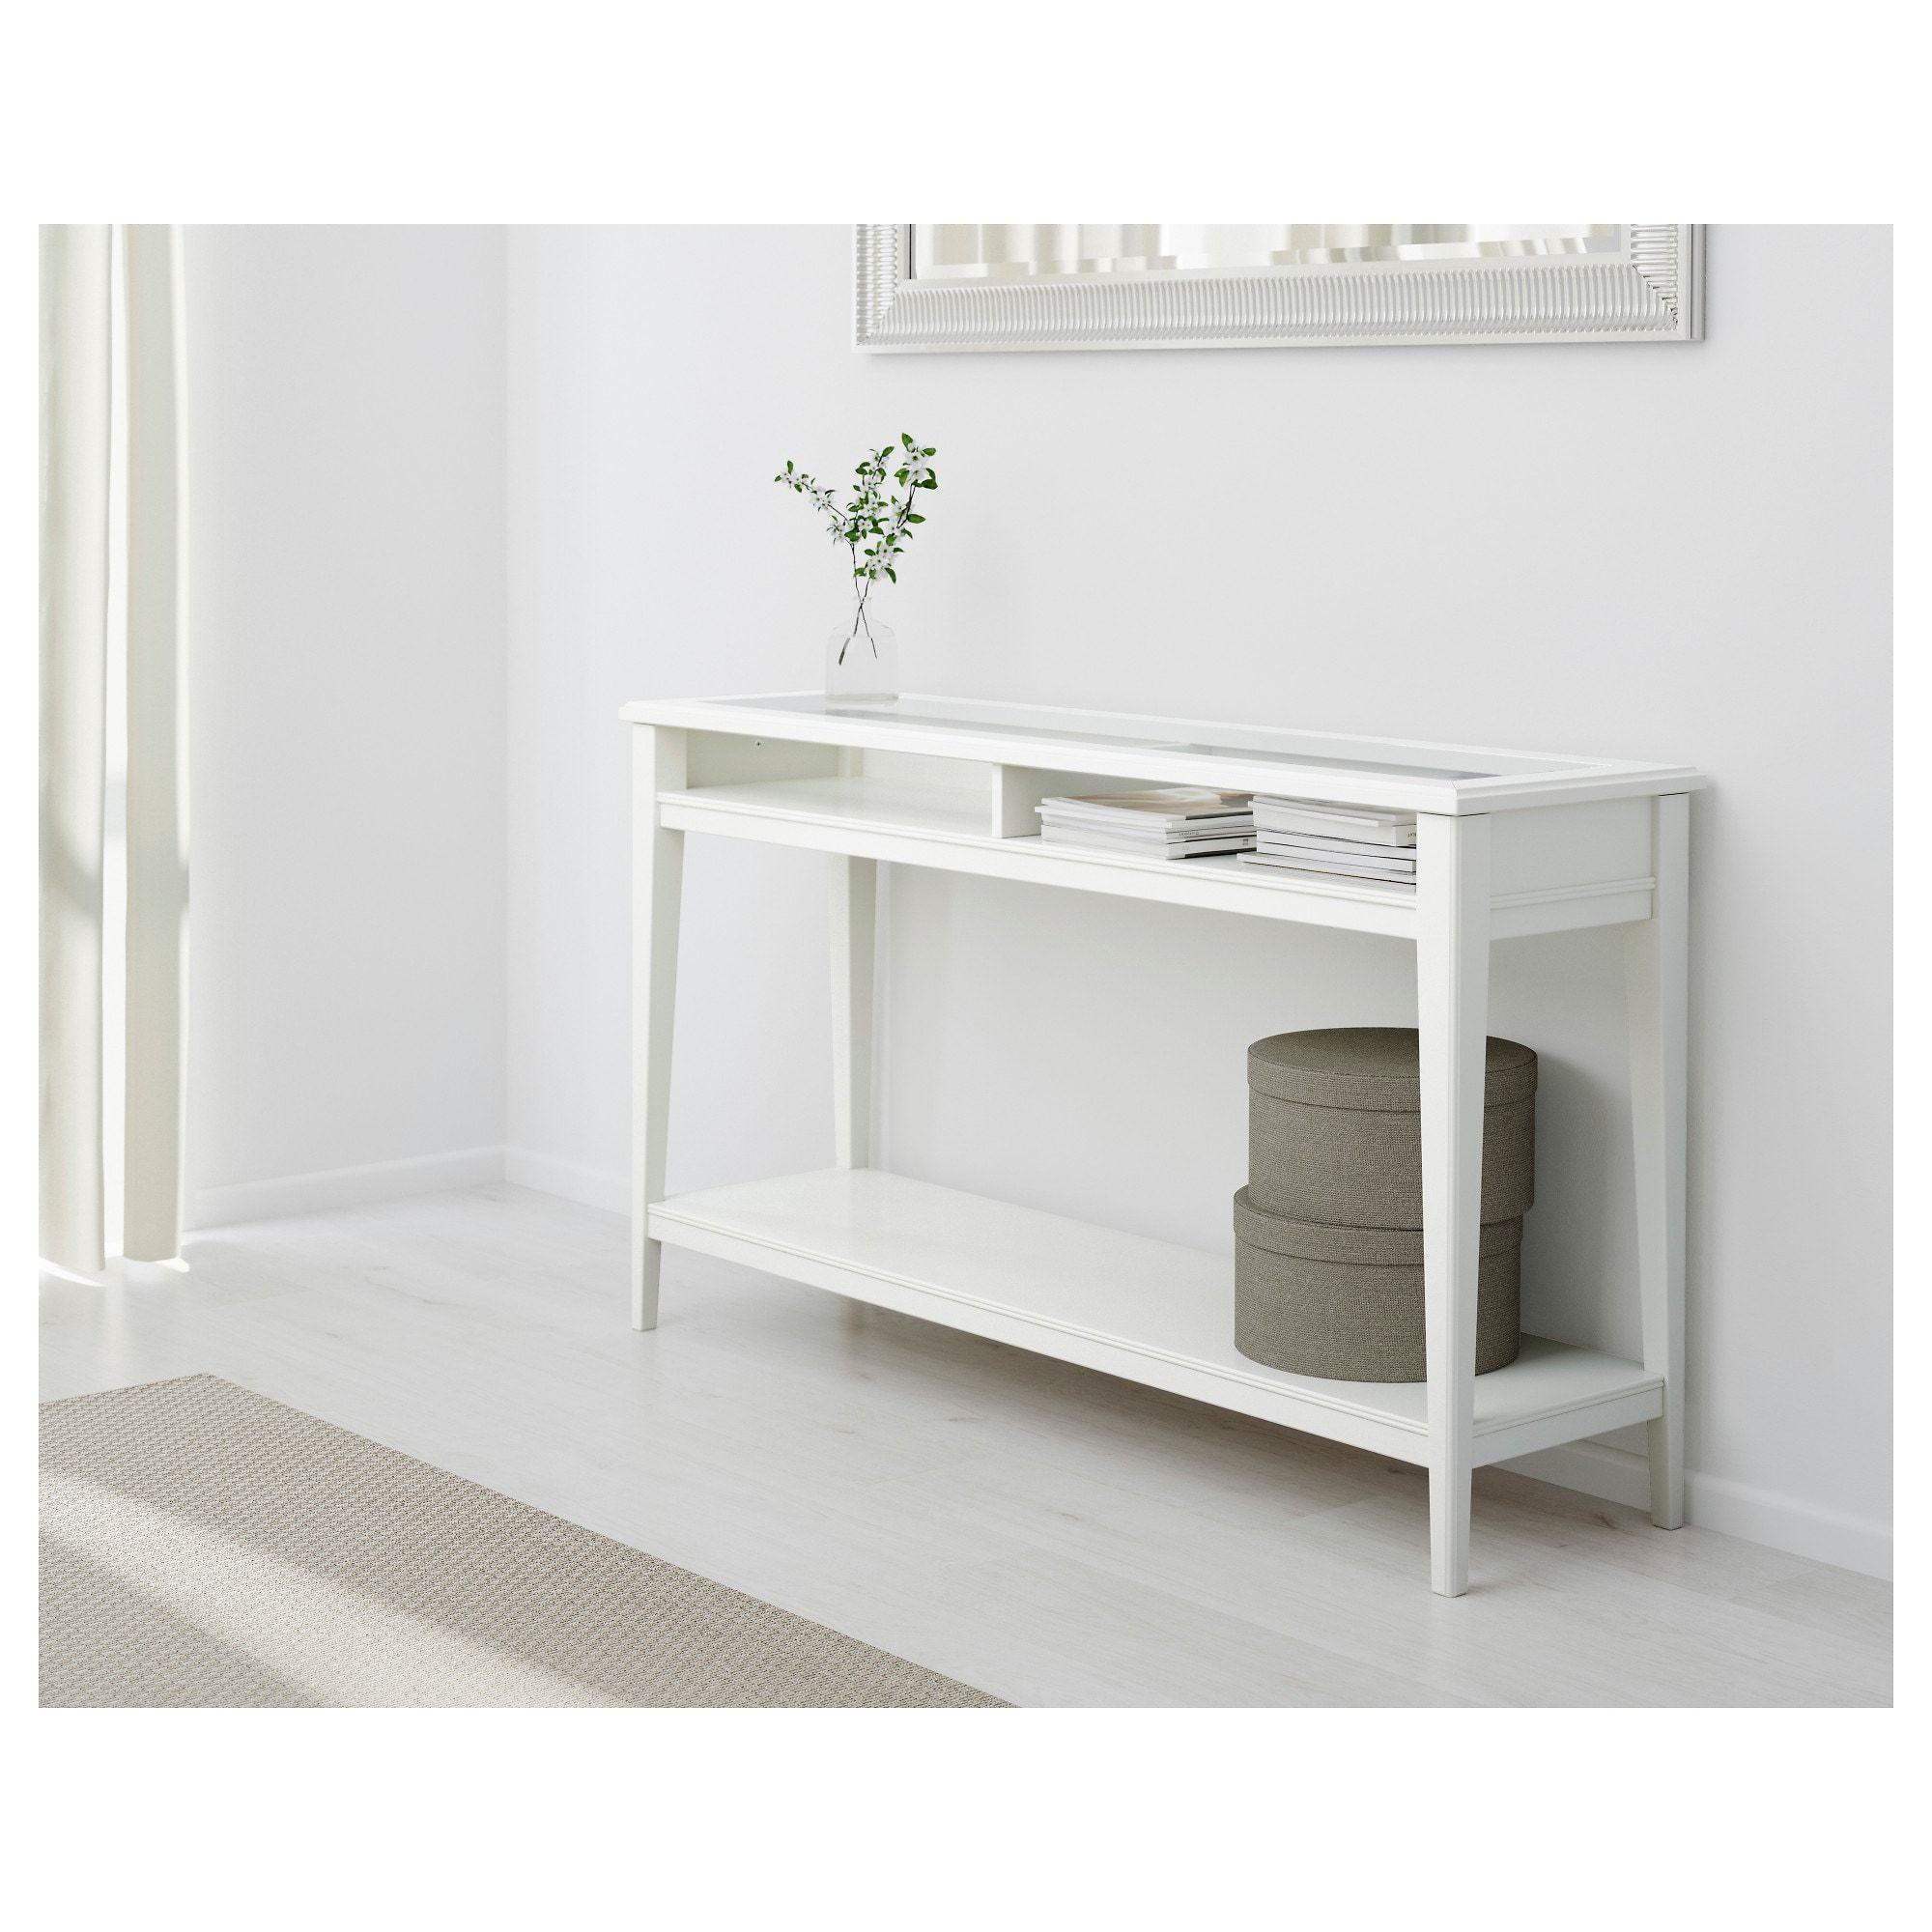 Liatorp Console Table White Glass 52 3 8x14 5 8 Ikea Ikea Console Table White Console Table Liatorp